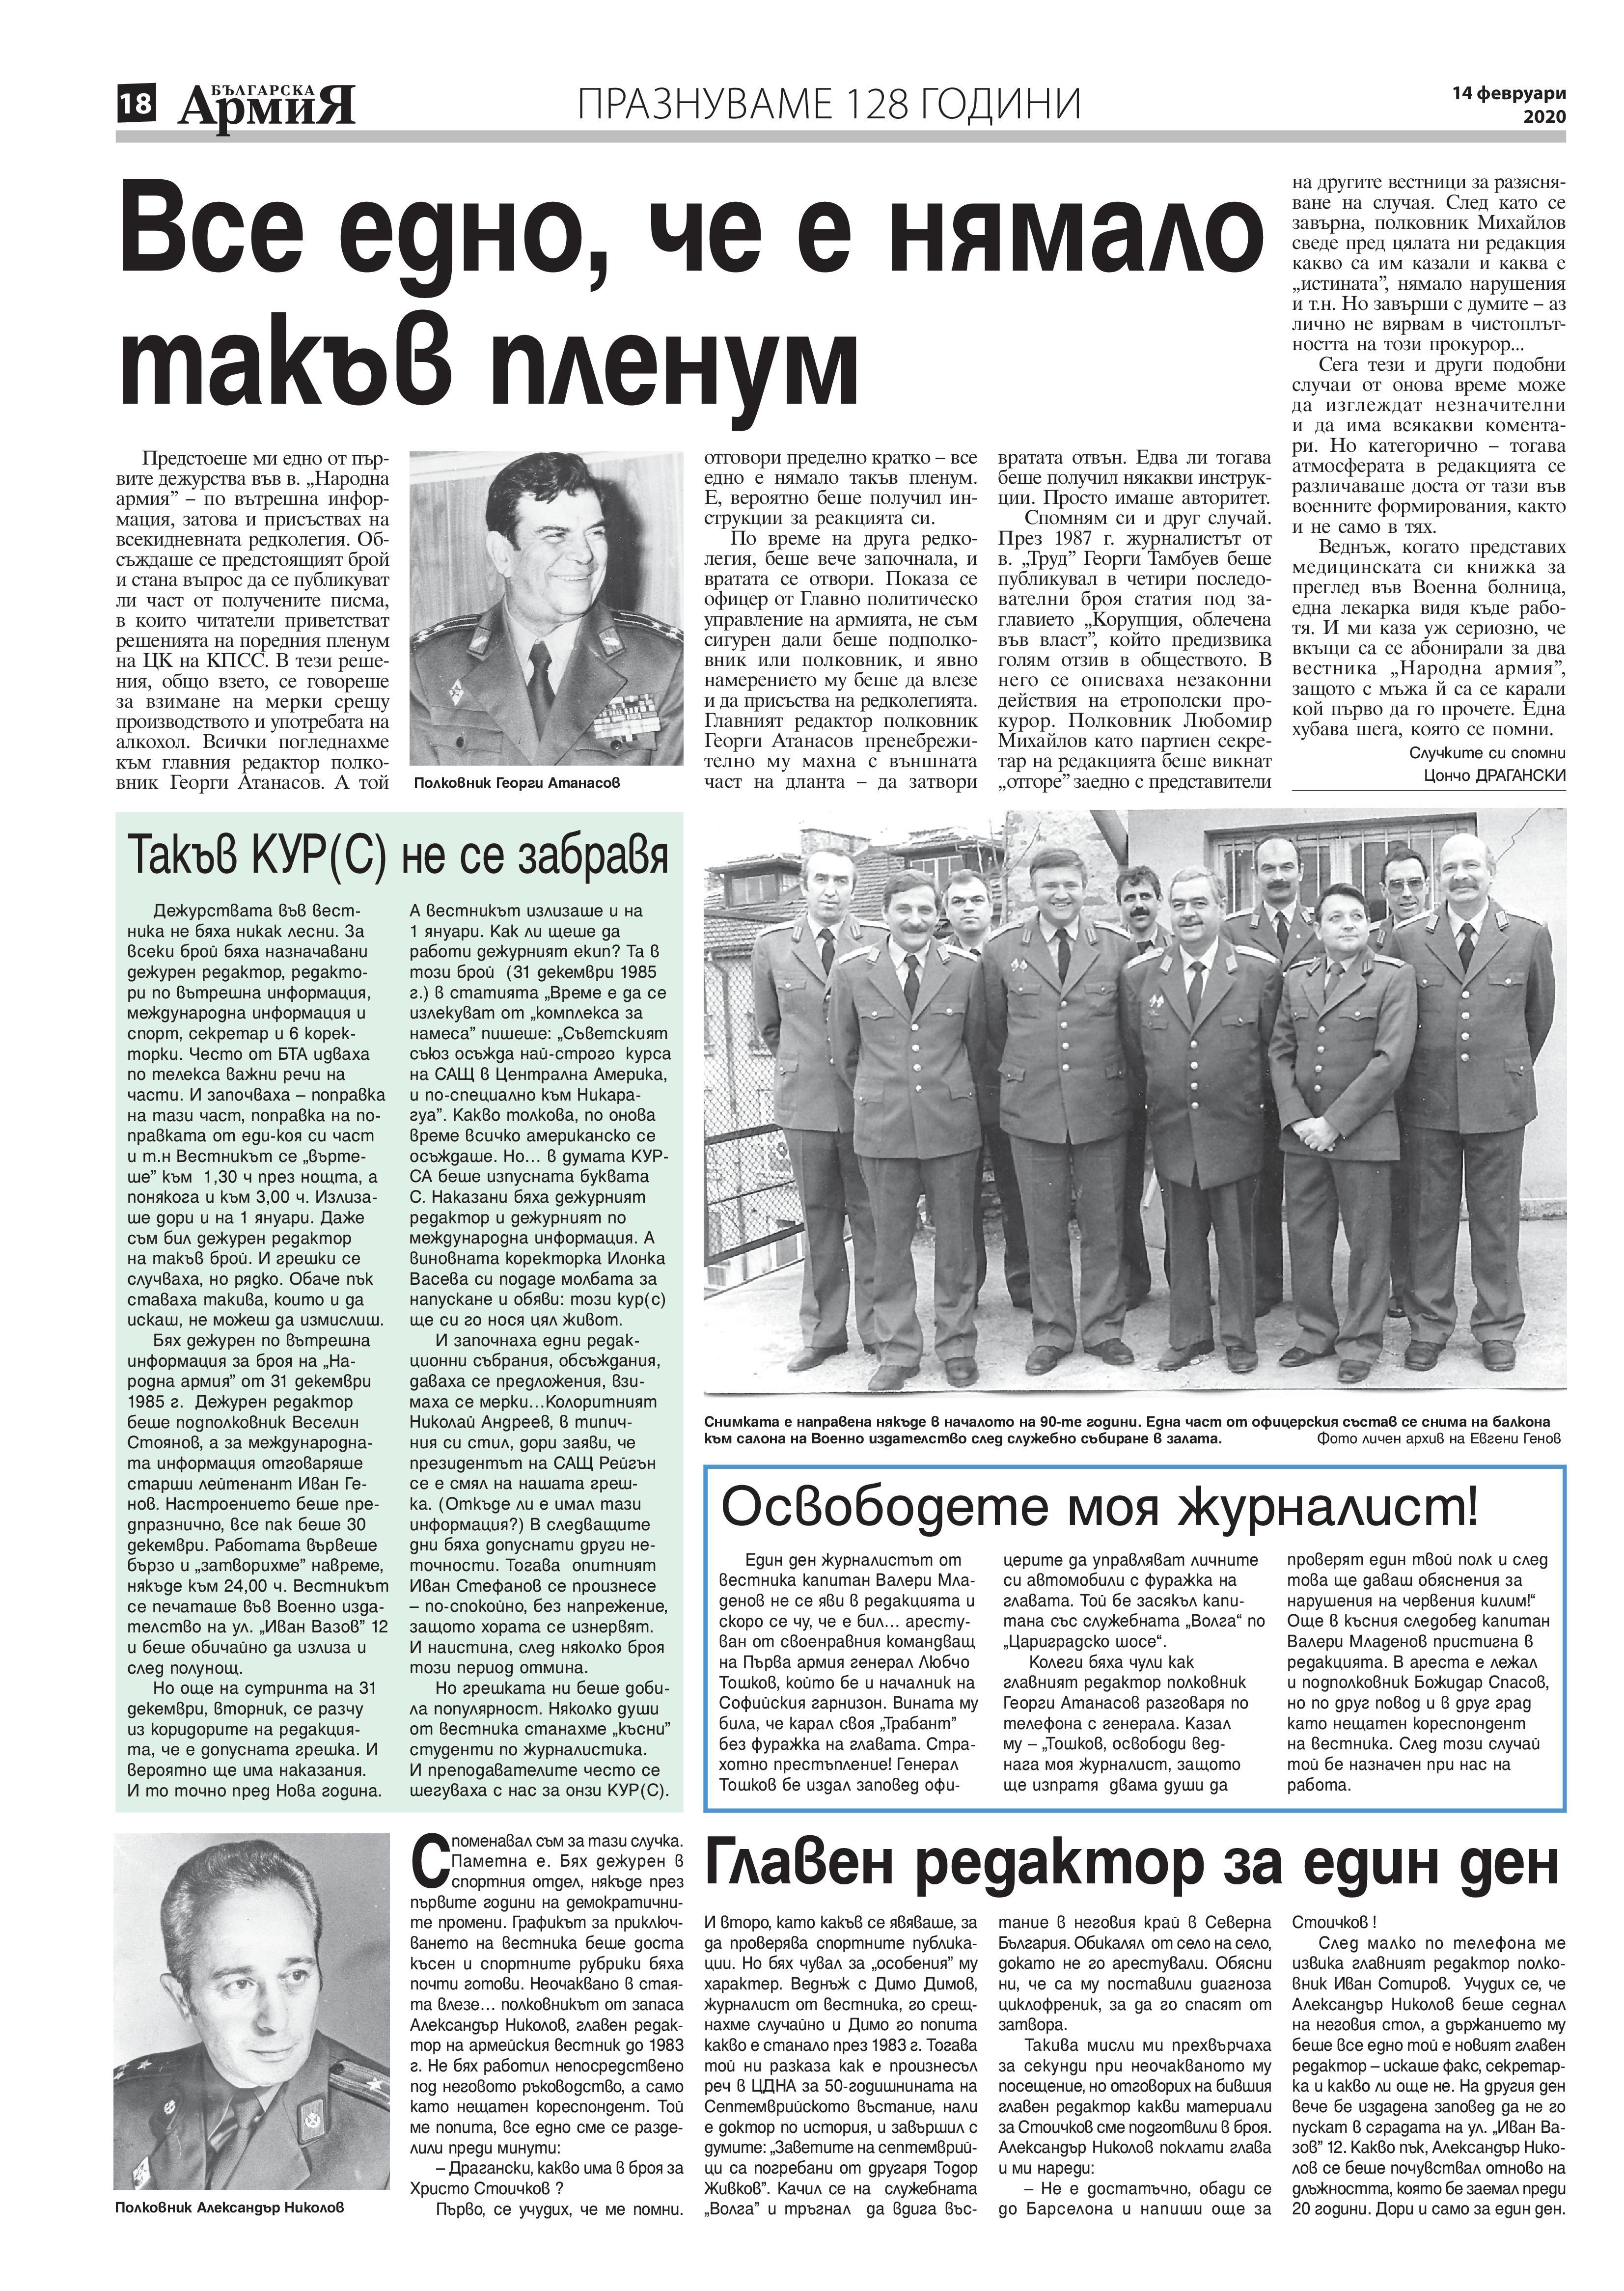 https://www.armymedia.bg/wp-content/uploads/2015/06/18-35.jpg